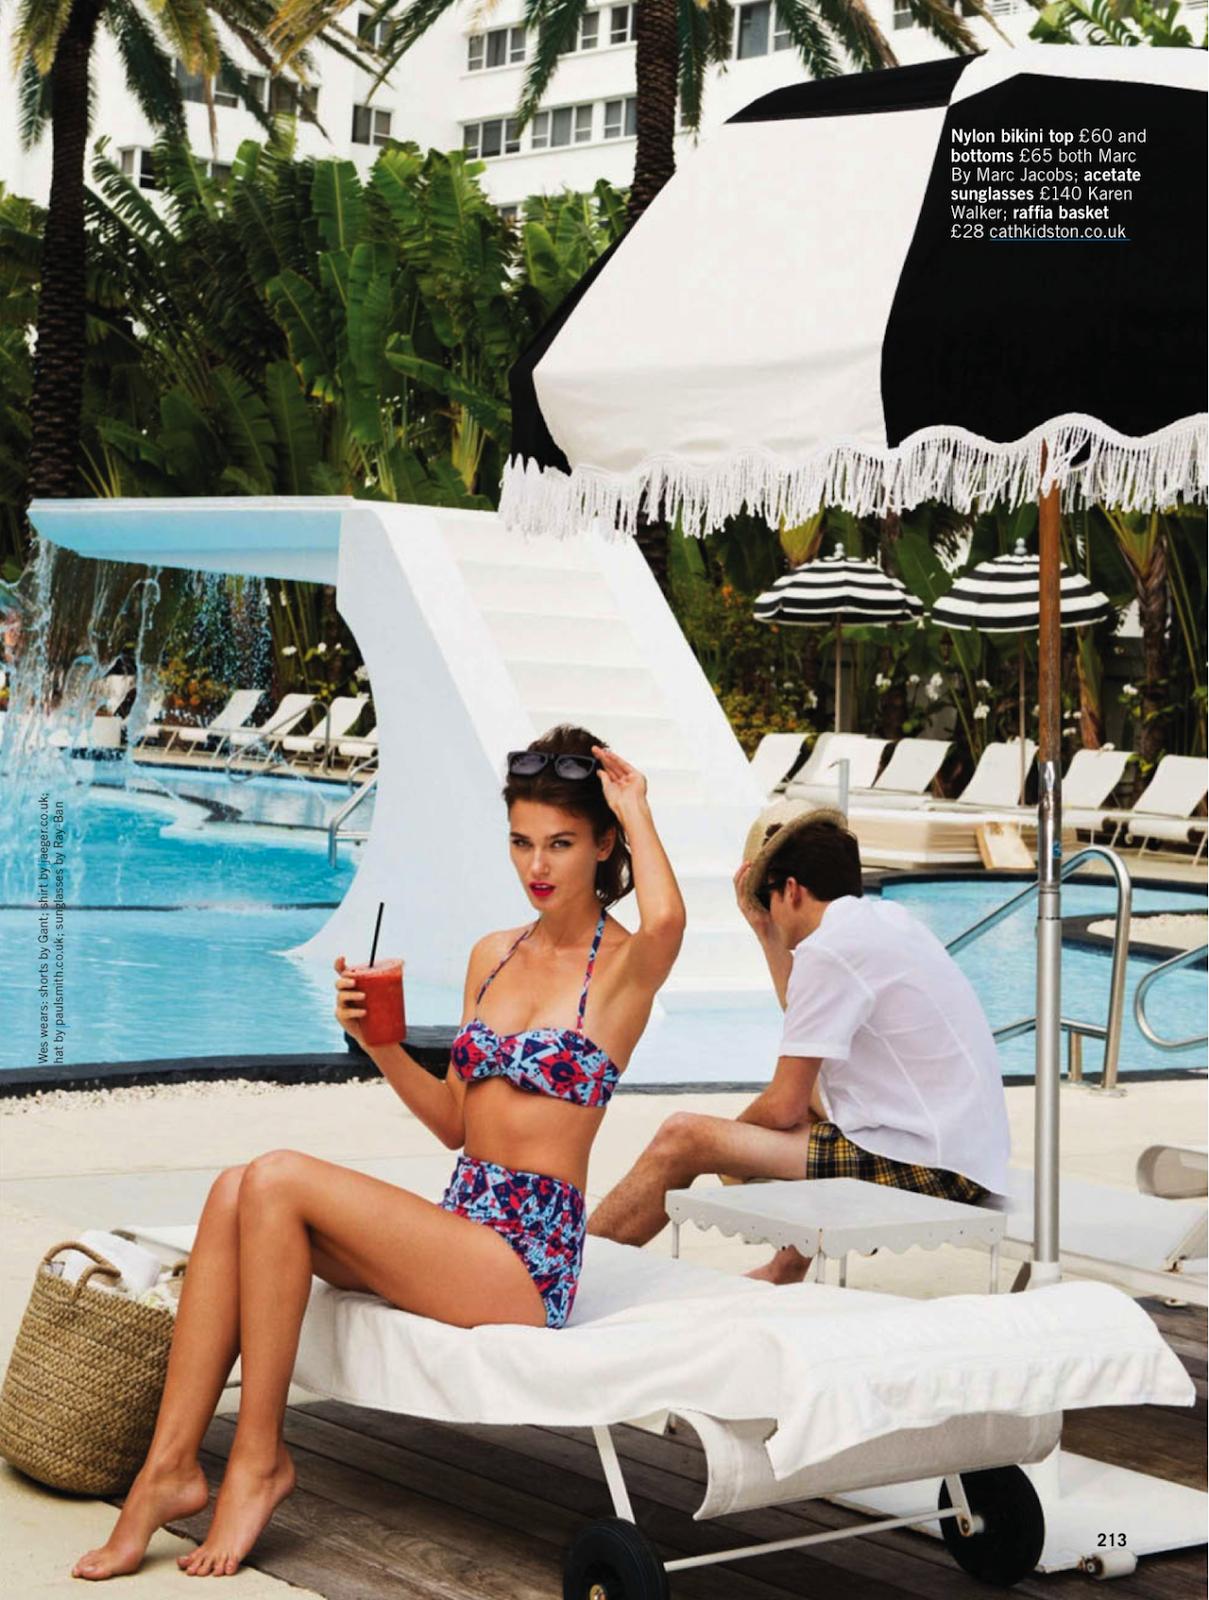 Sun sea glamour Rudi Ovchinnikova and Wes by Pamela Hanson for Glamour UK May 2013 5